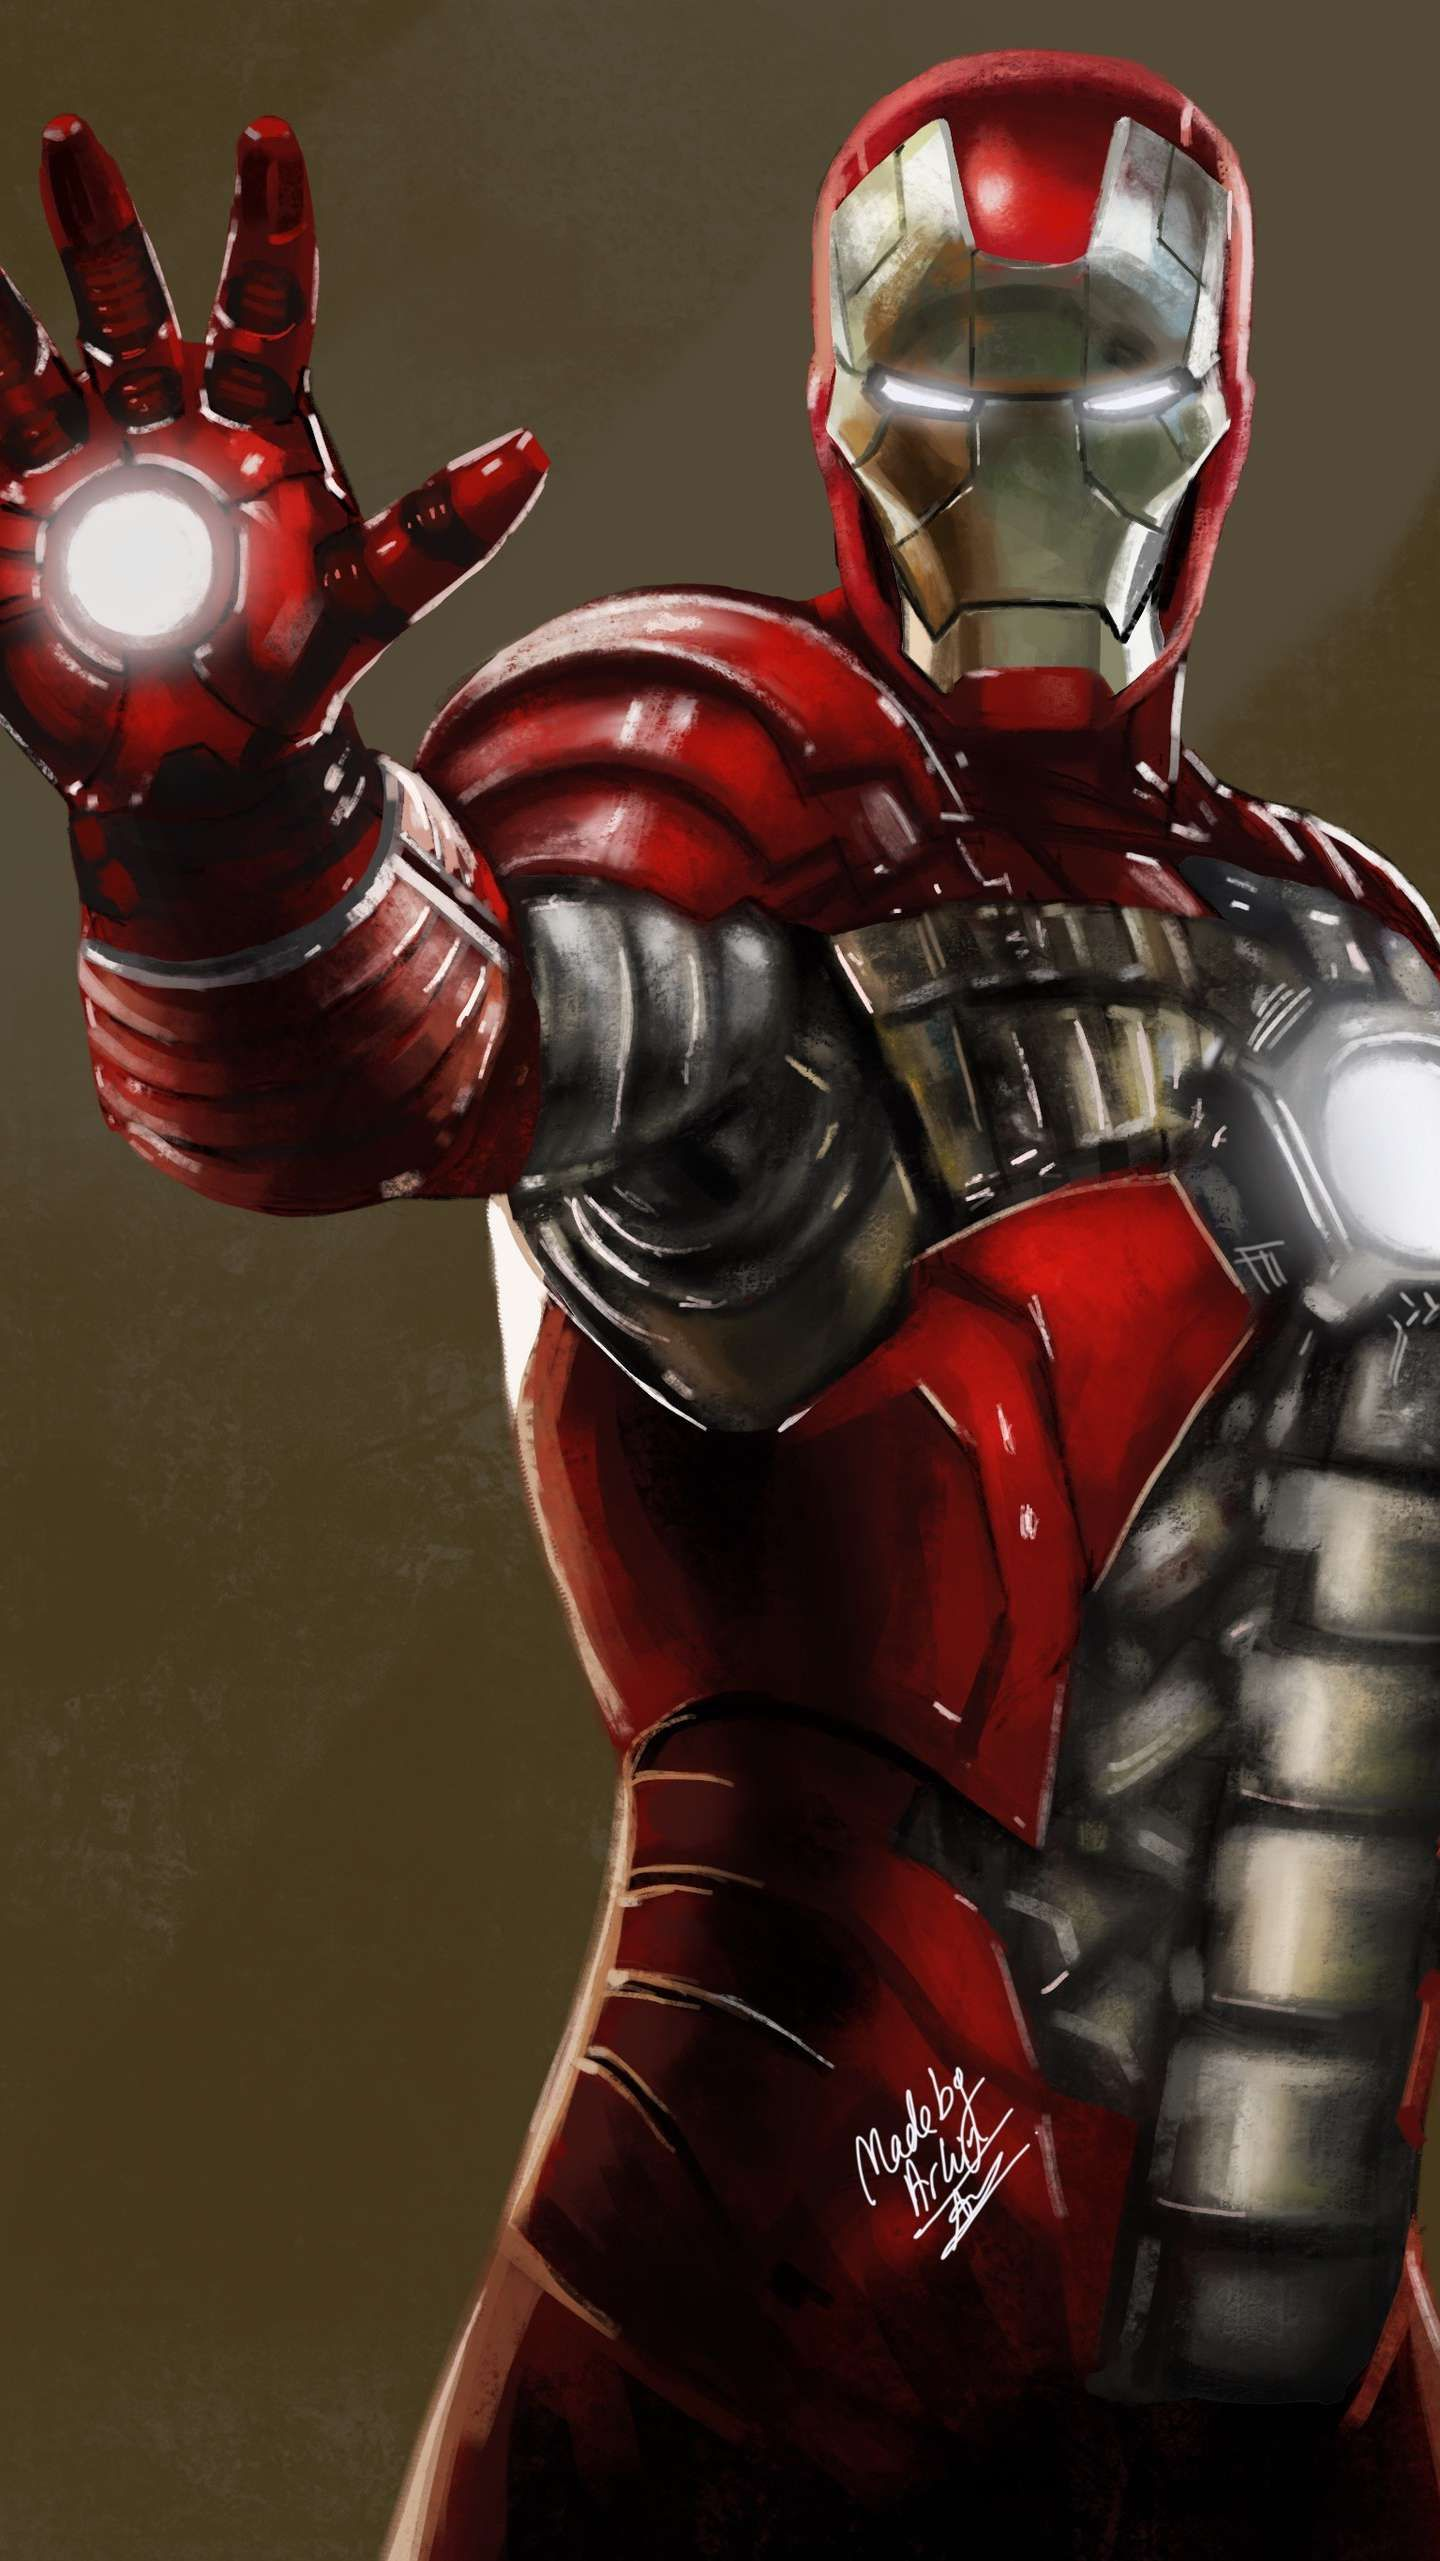 Iron Man Suitcase Armor Mark 5 IPhone Wallpaper Iron man